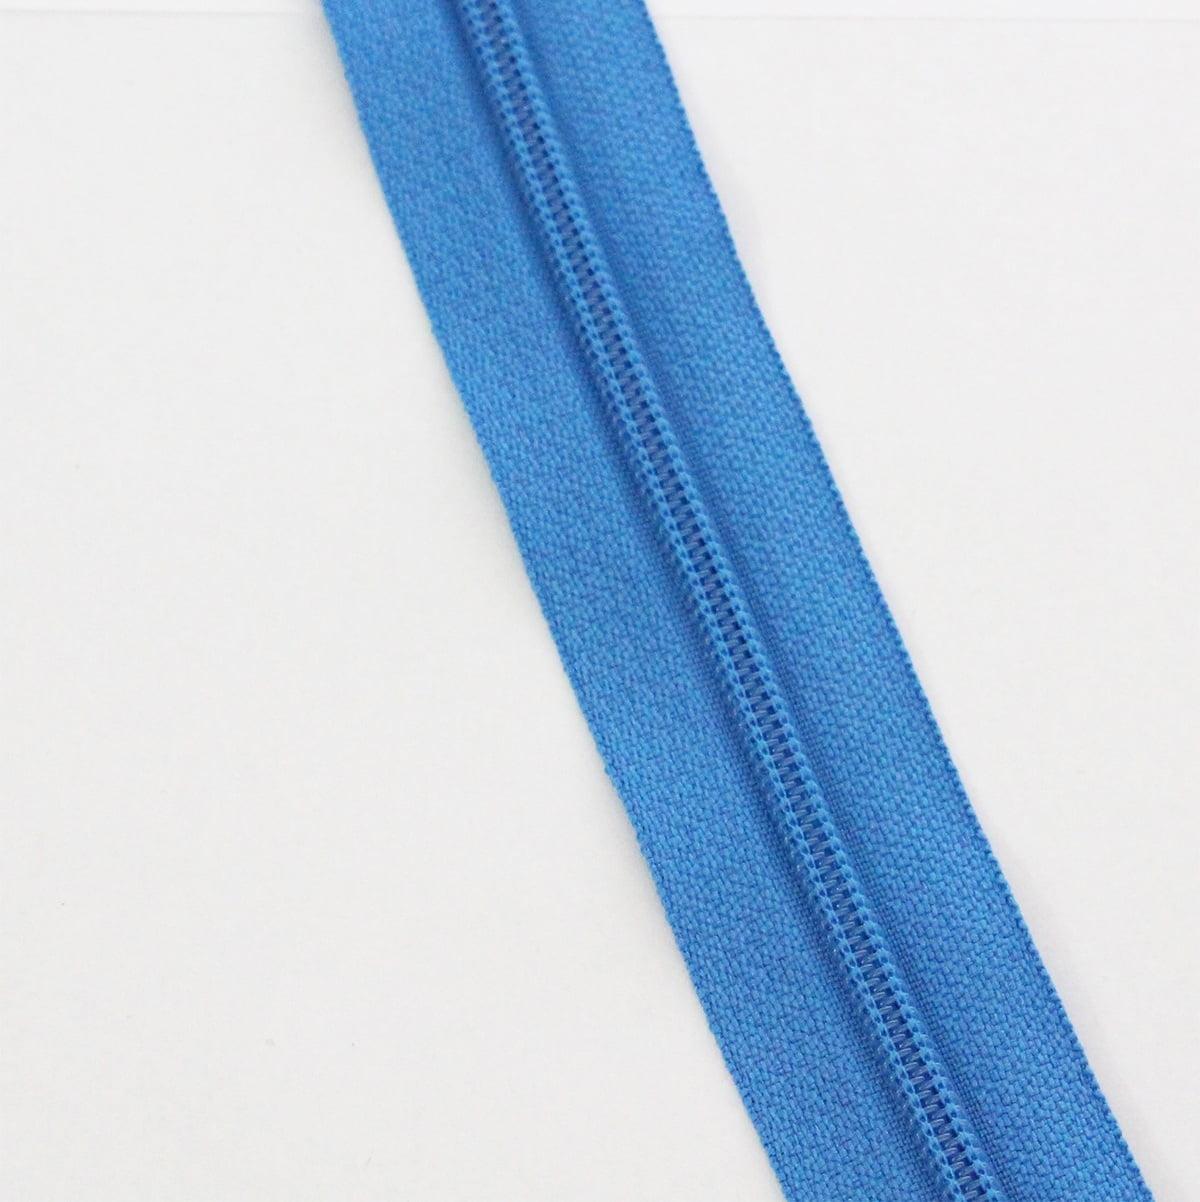 Zíper Metro 4,5mm - Azul Céu Escuro